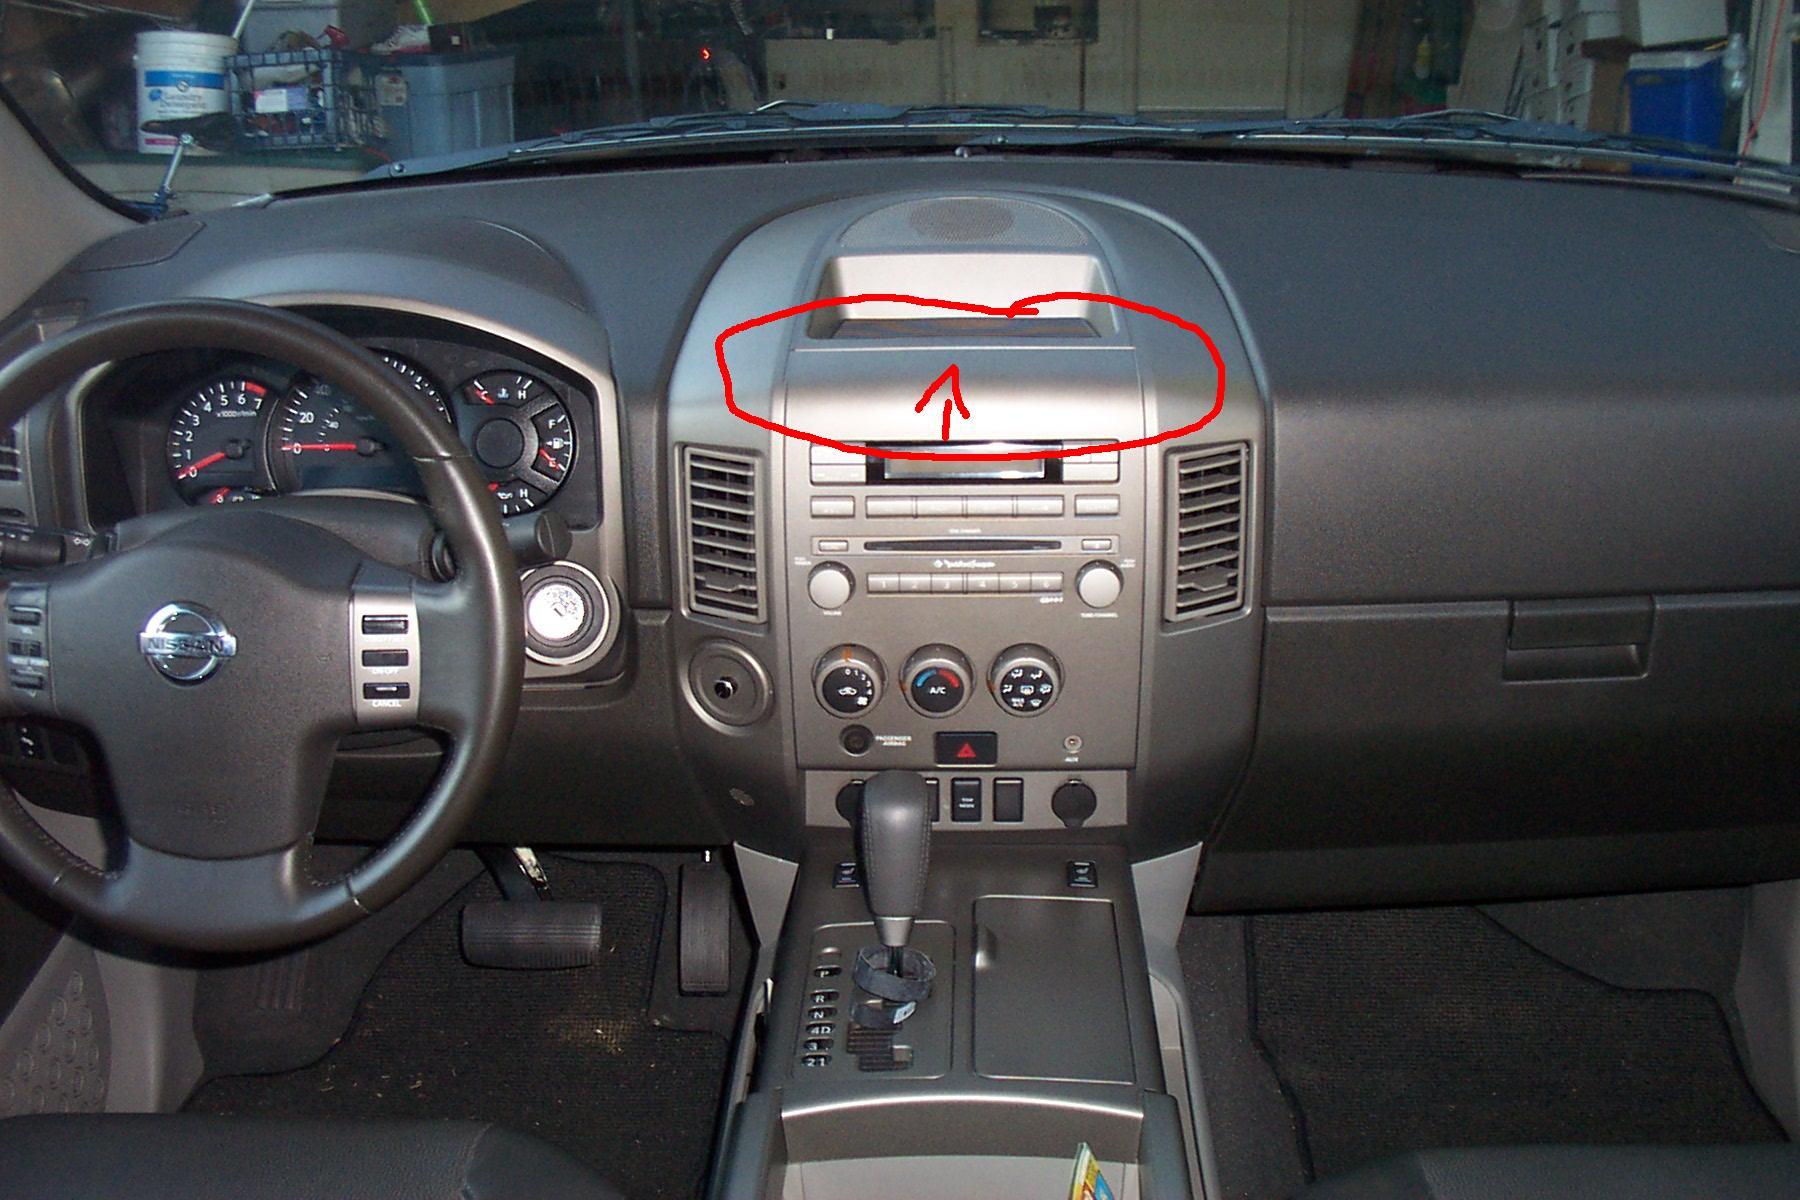 Nissan Armada 2006 Interior >> how to remove dash? - Nissan Titan Forum